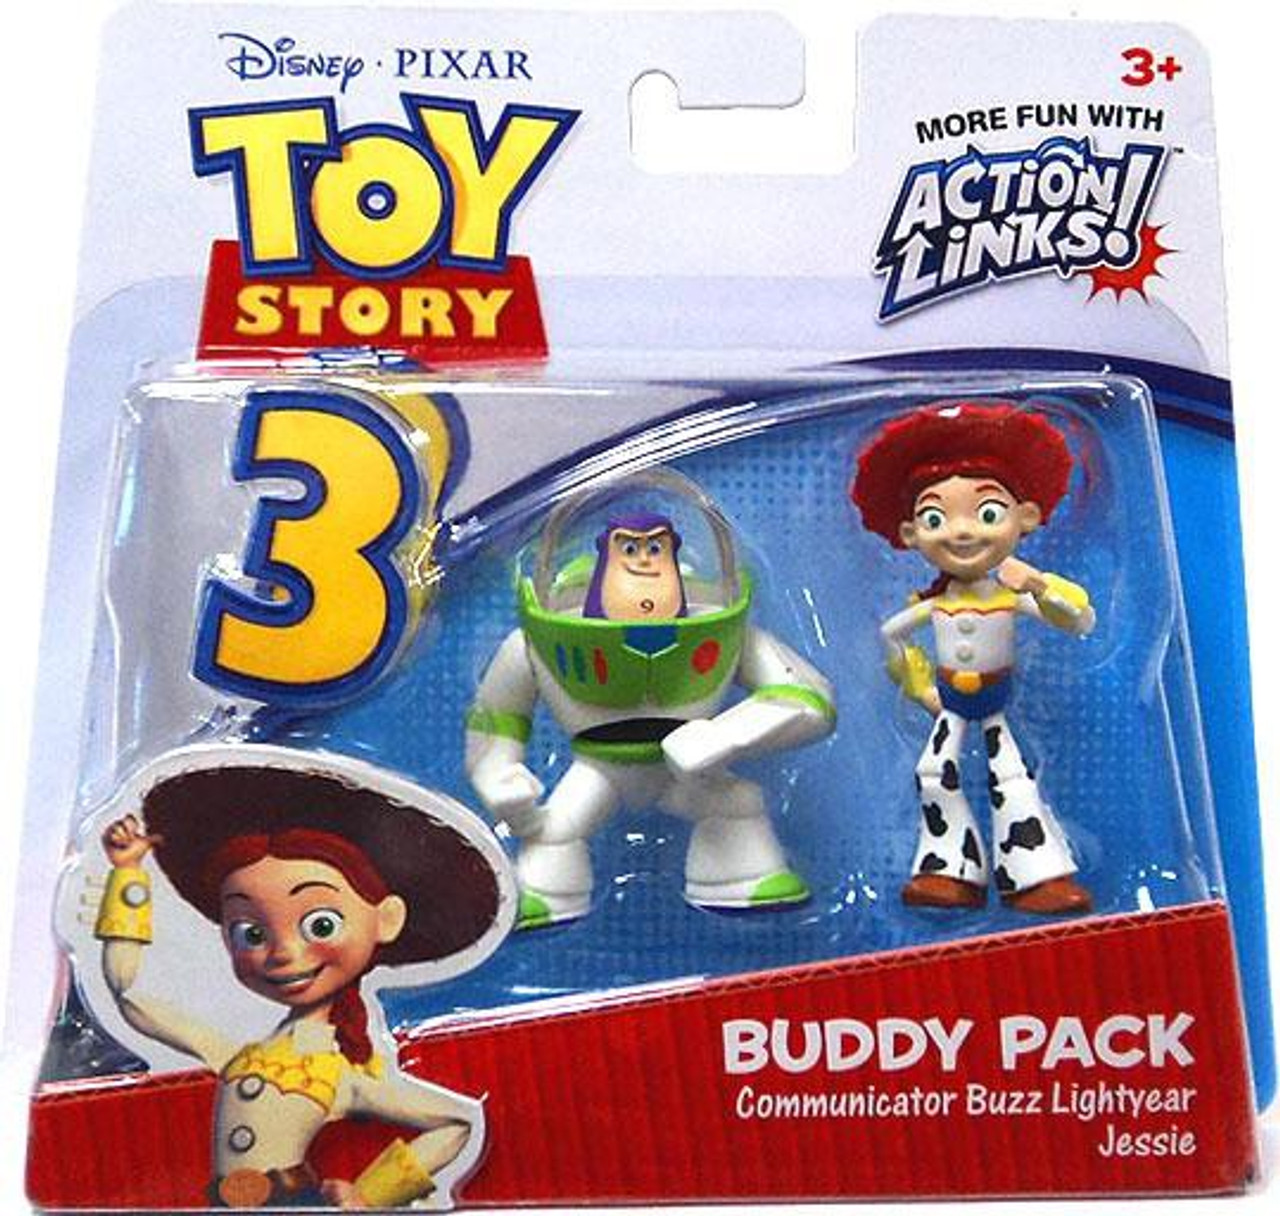 Toy Story 3 Action Links Buddy Pack Communicator Buzz Lightyear Jessie Mini  Figure 2-Pack Mattel Toys - ToyWiz 3984d7a8415